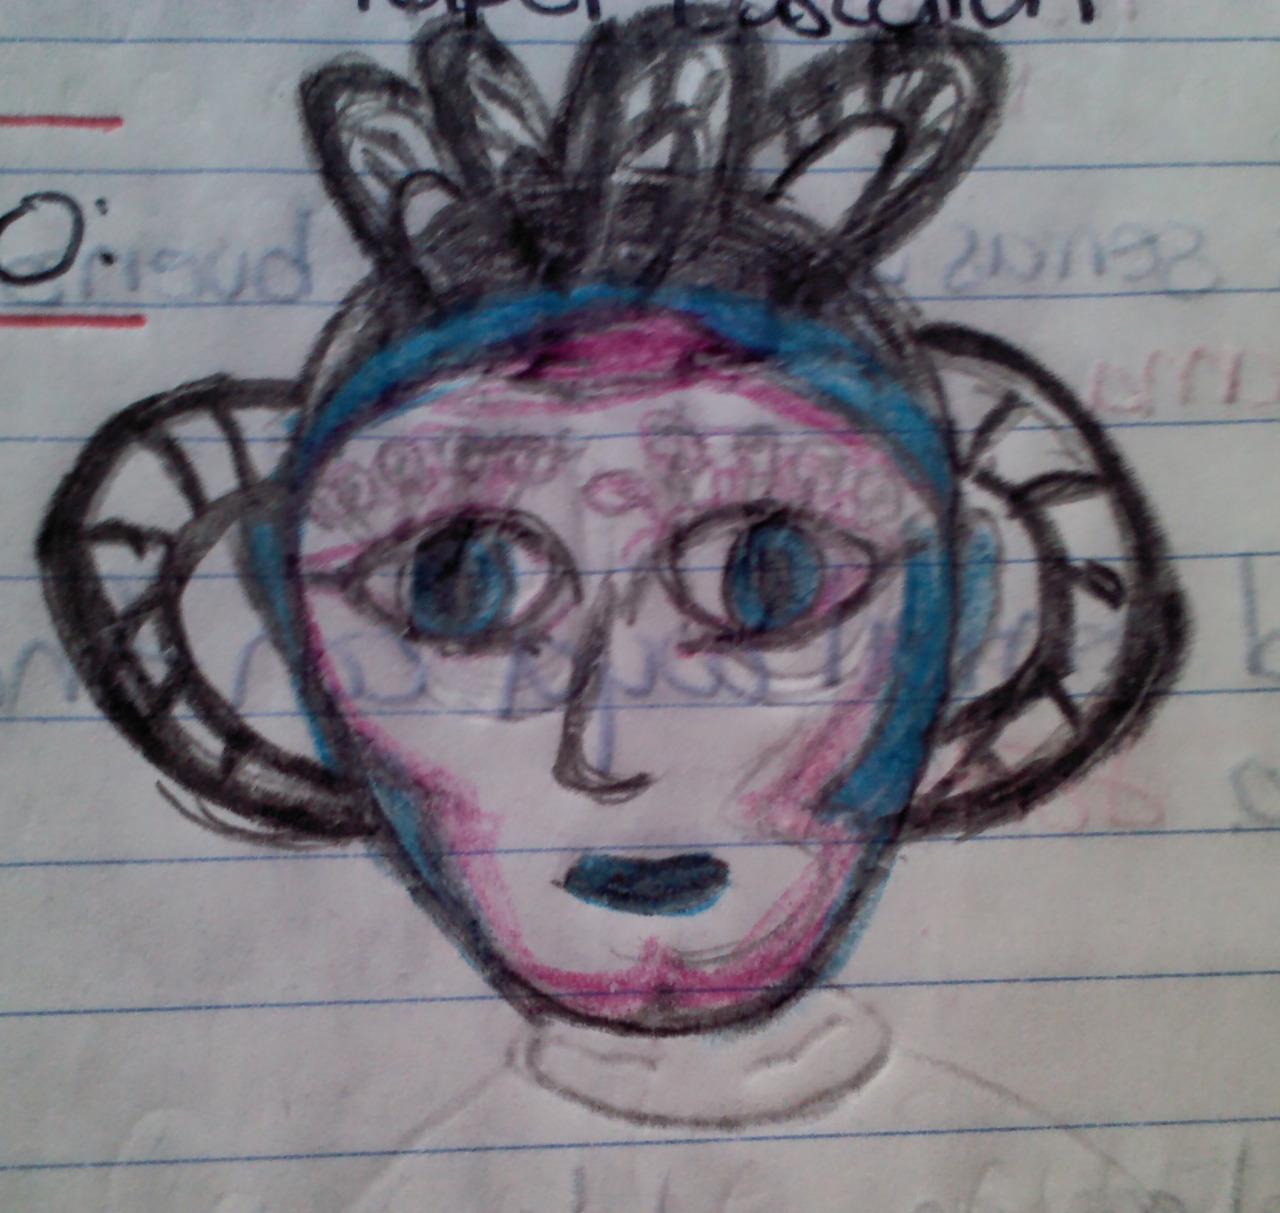 Dibujos a mano - Página 4 Tumblr_m39cwiSGum1ro6f9po7_1280